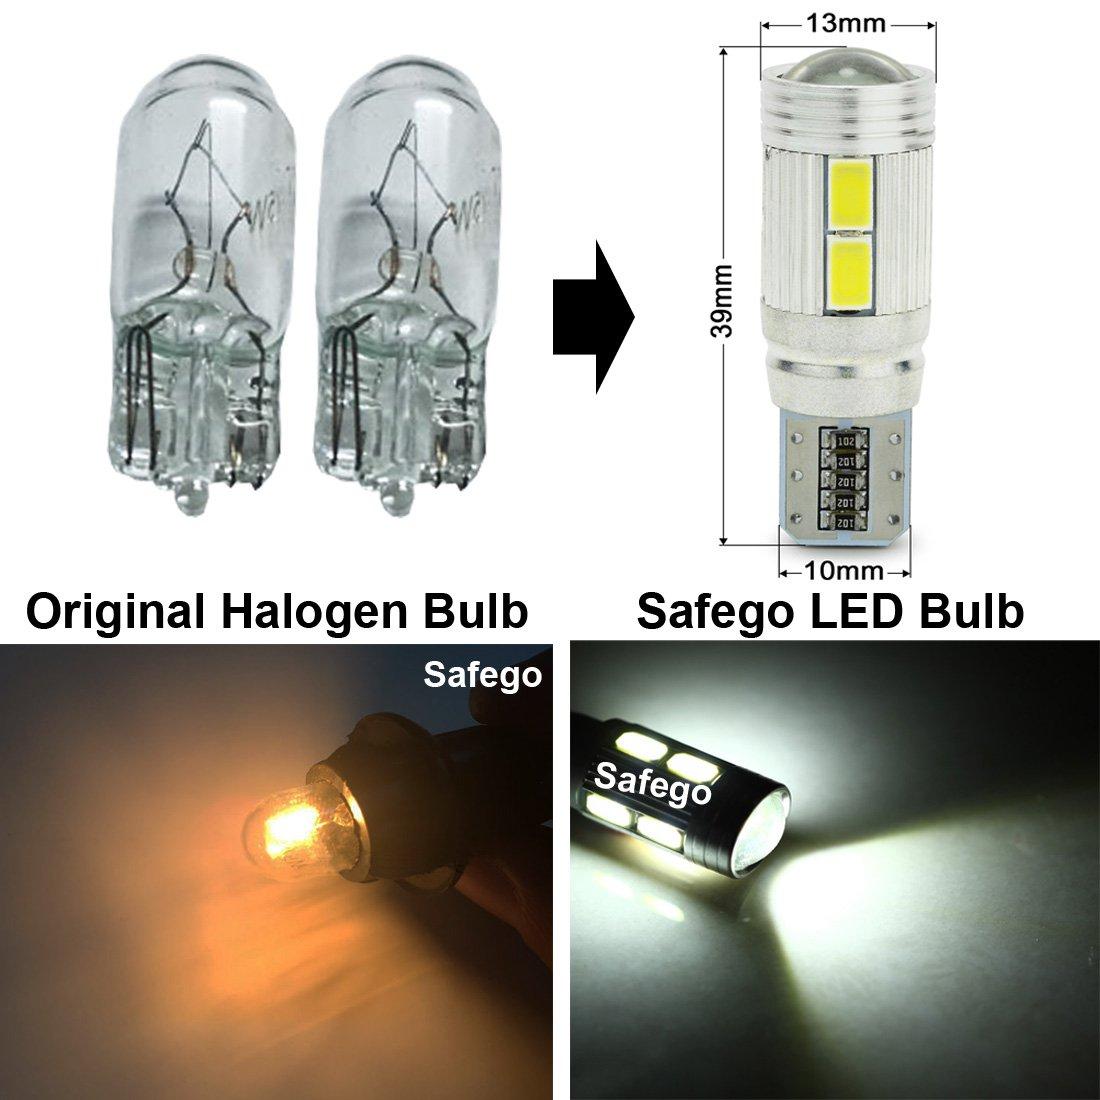 2x T10 W5W LED CANBUS no hay errores Bombillas exteriores 10 SMD 5630 Luz Coche trasera Lámpara Blanco Xenon Luz de interior T10 Wedge Lampara para Coches ...